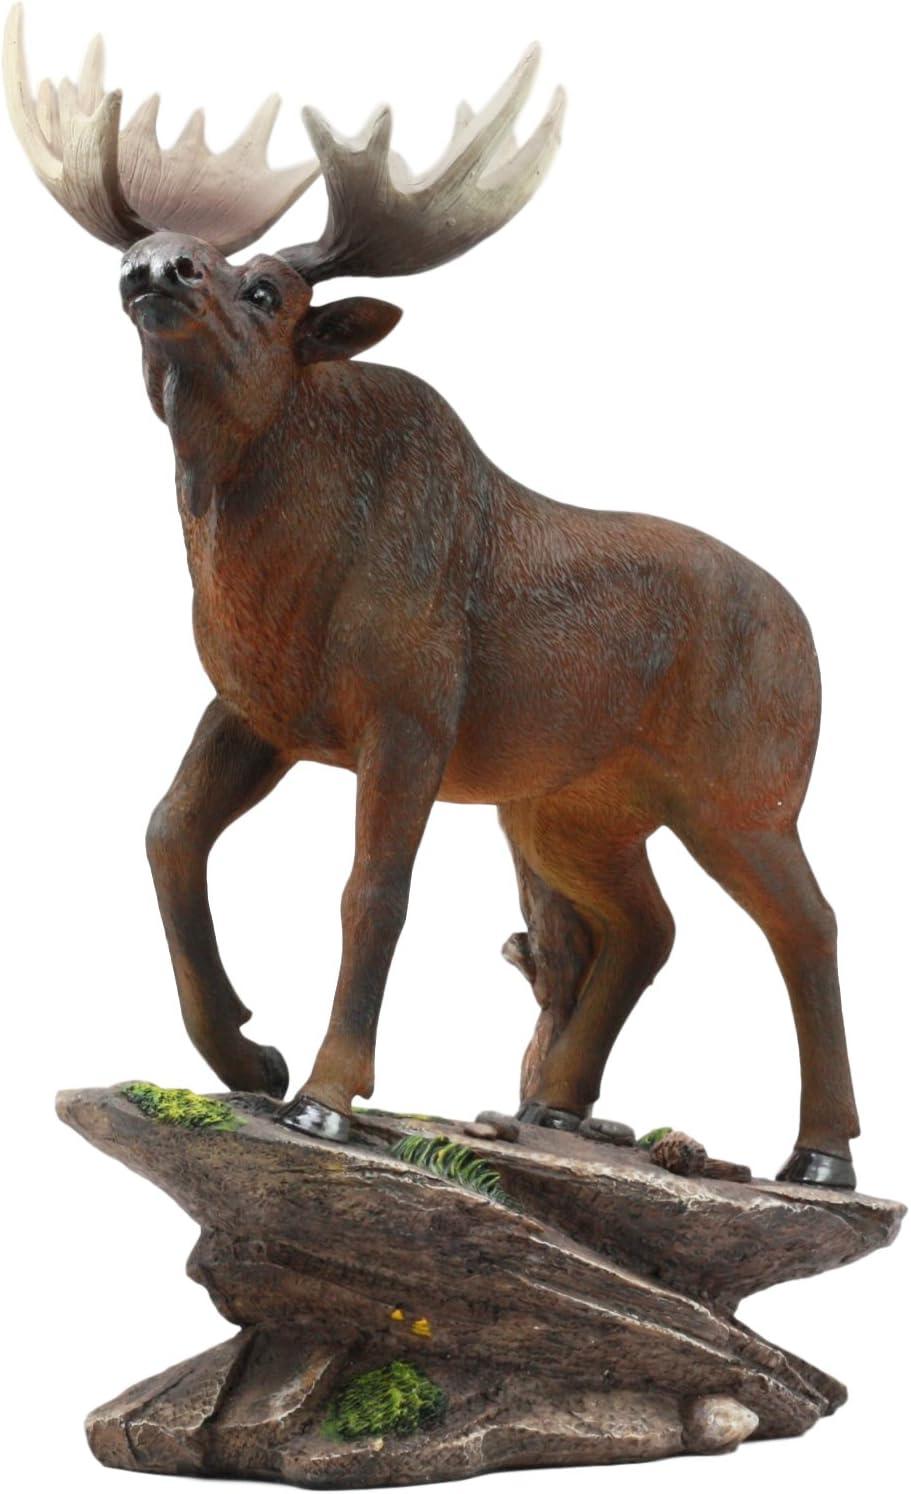 "Ebros The Emperor Pride Realistic Bull Moose Standing On Rock Statue 13.5"" Tall Wildlife Elk Deer Woodlands Decor Figurine"